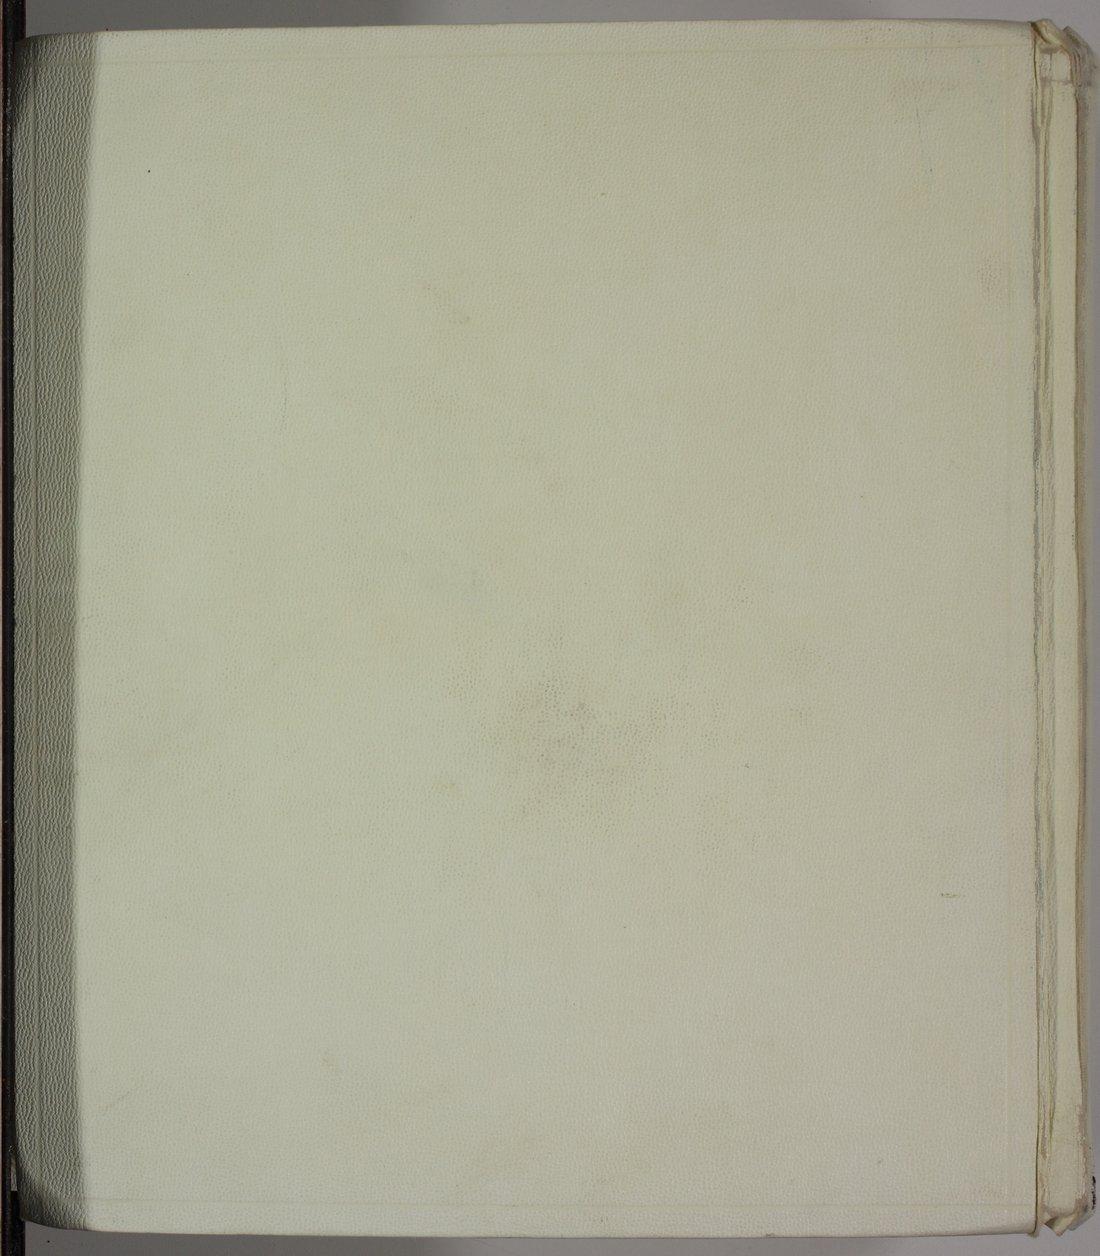 Kansas Woman's Christian Temperance Union memory book - 711 [Back Cover]